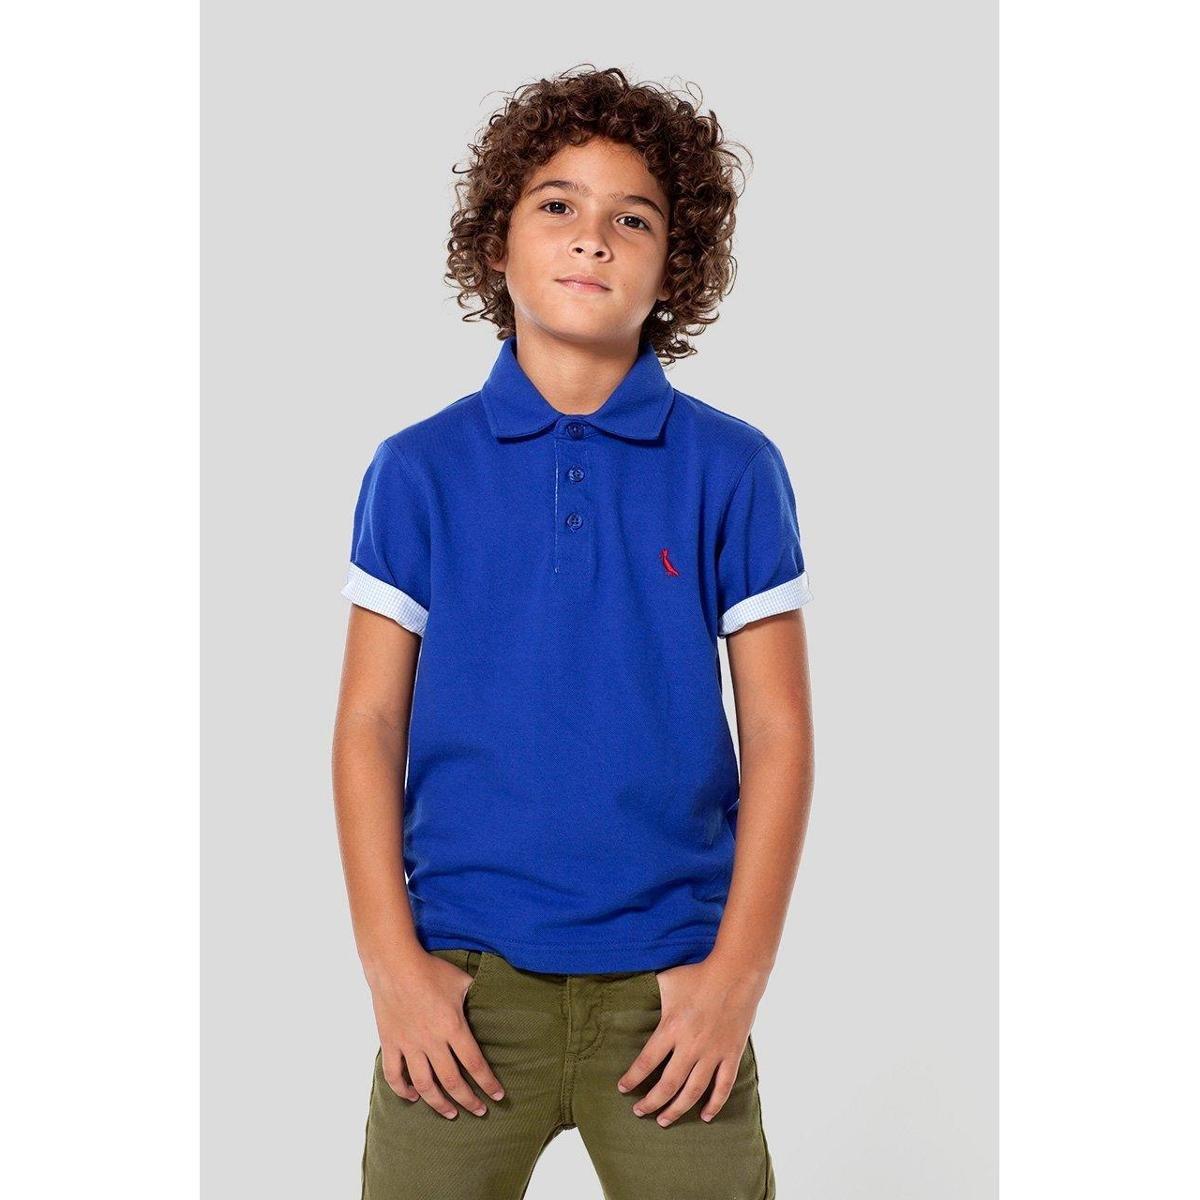 c79bb3a0338b8 Camisa Polo Masculina Infantil Mini Piquet Pala Interna Listrada Reserva  Mini - Azul Claro